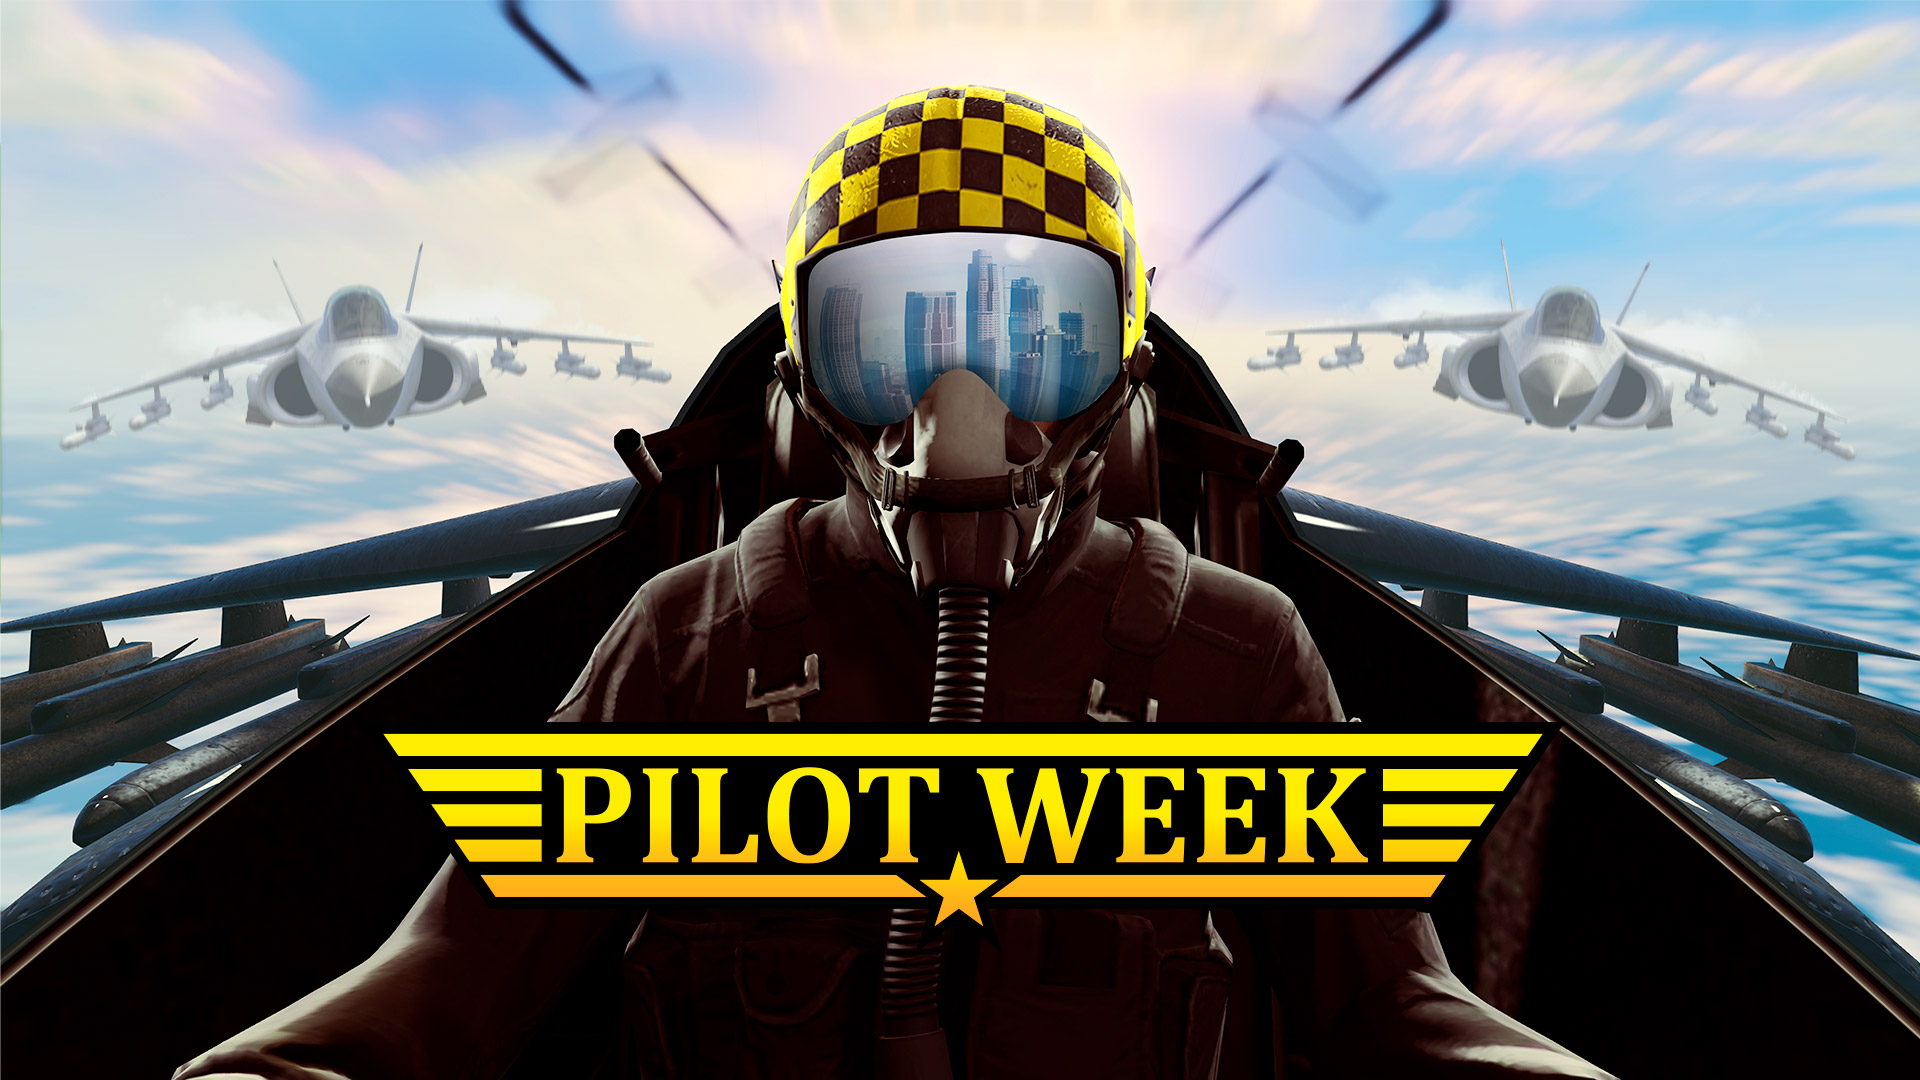 《GTA5》在线模式飞行员活动周 可免费领取滑翔机